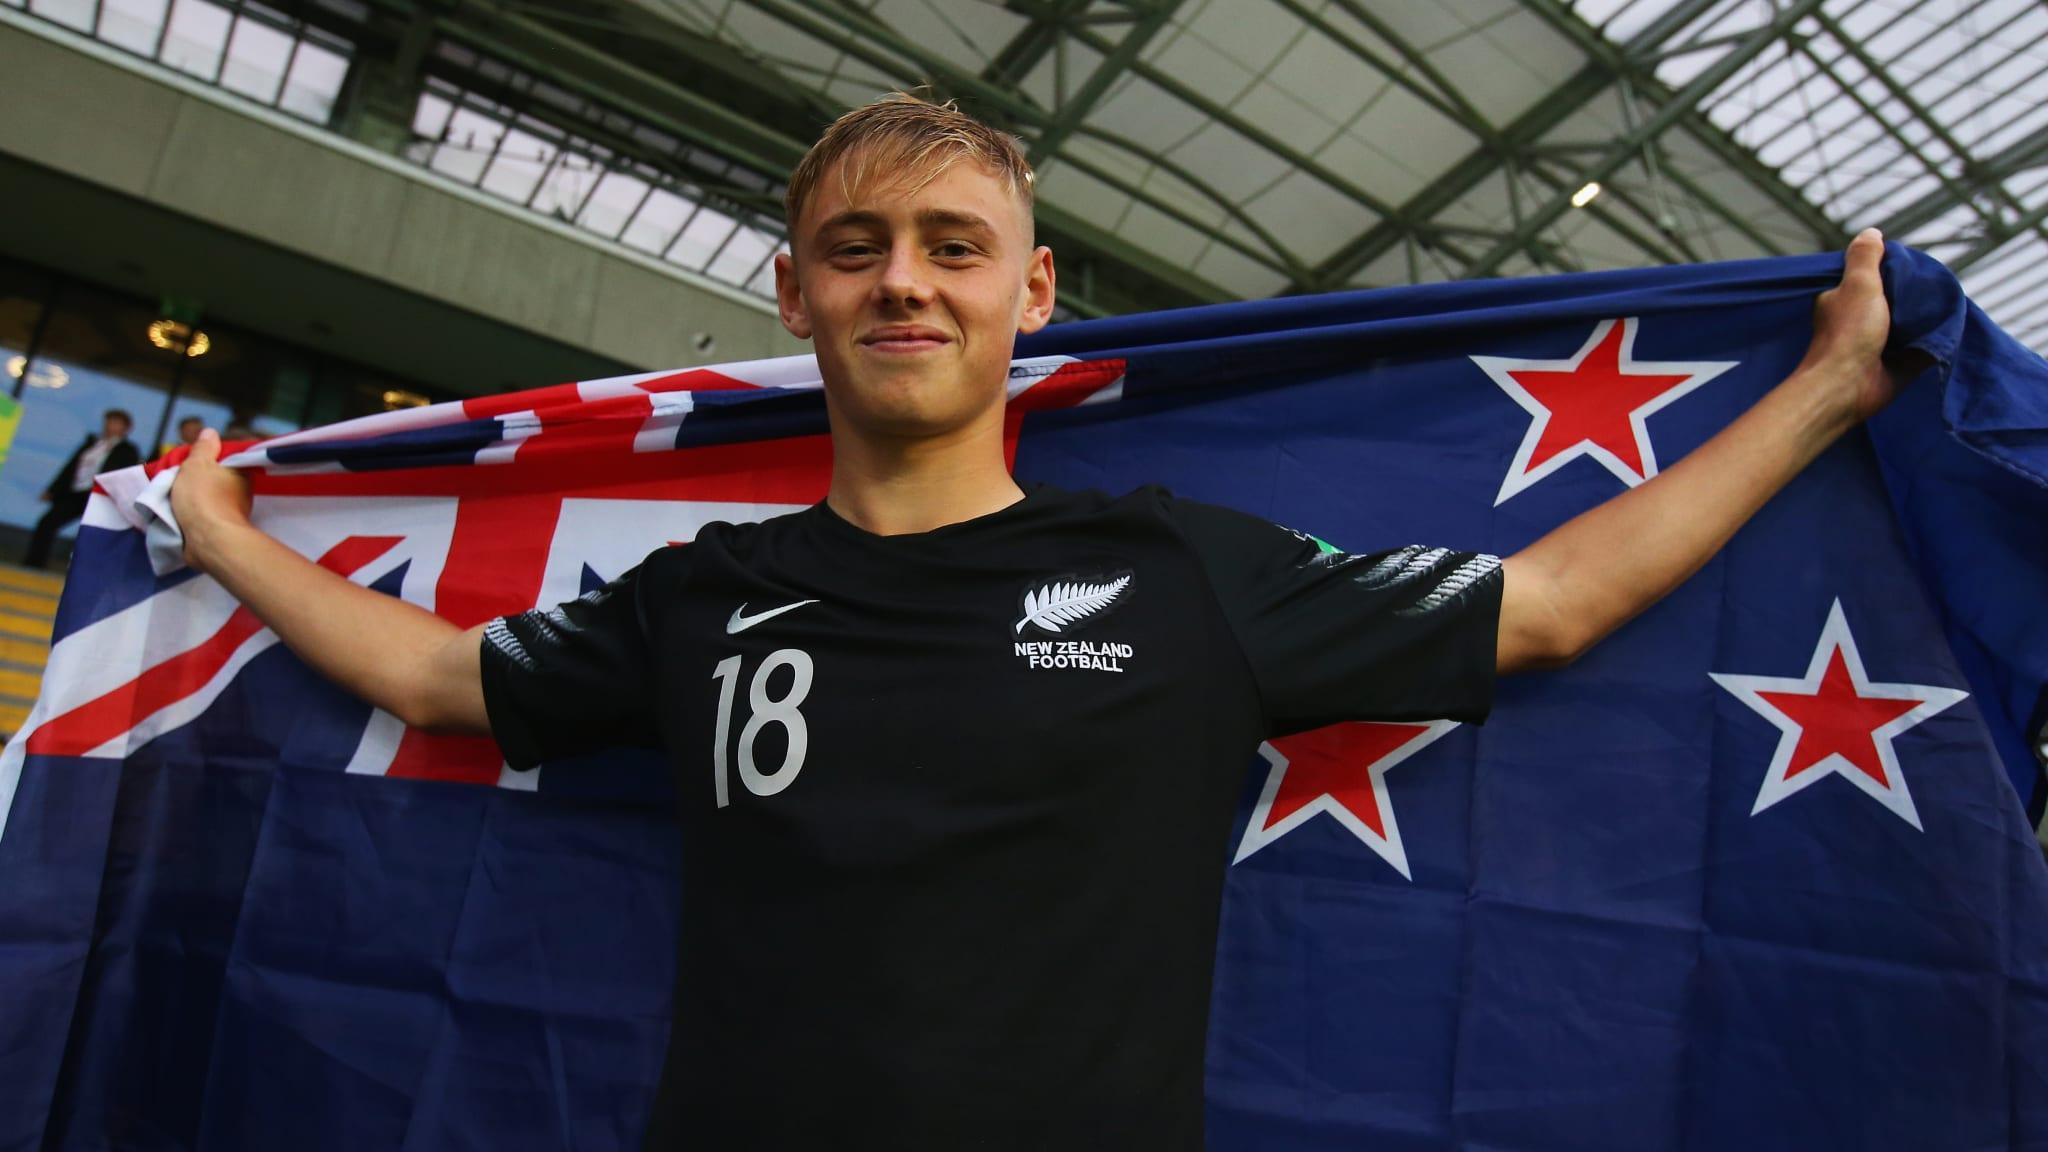 FIFA U 20 World Cup Poland 2019   News   From ball boy to World 2048x1152